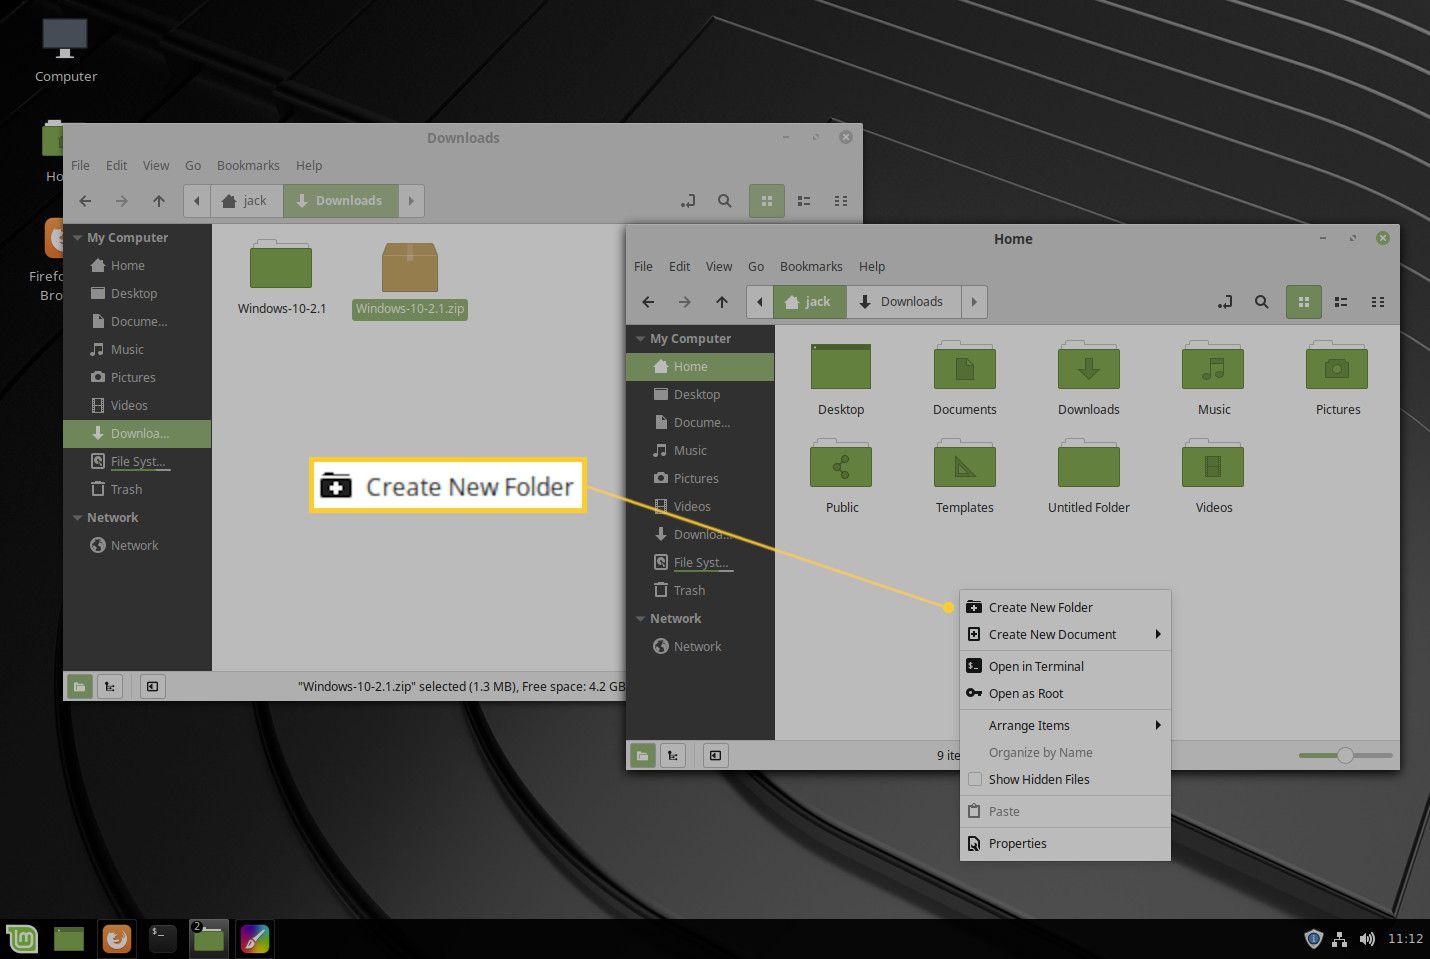 Screenshot of the Create New Folder menu entry.